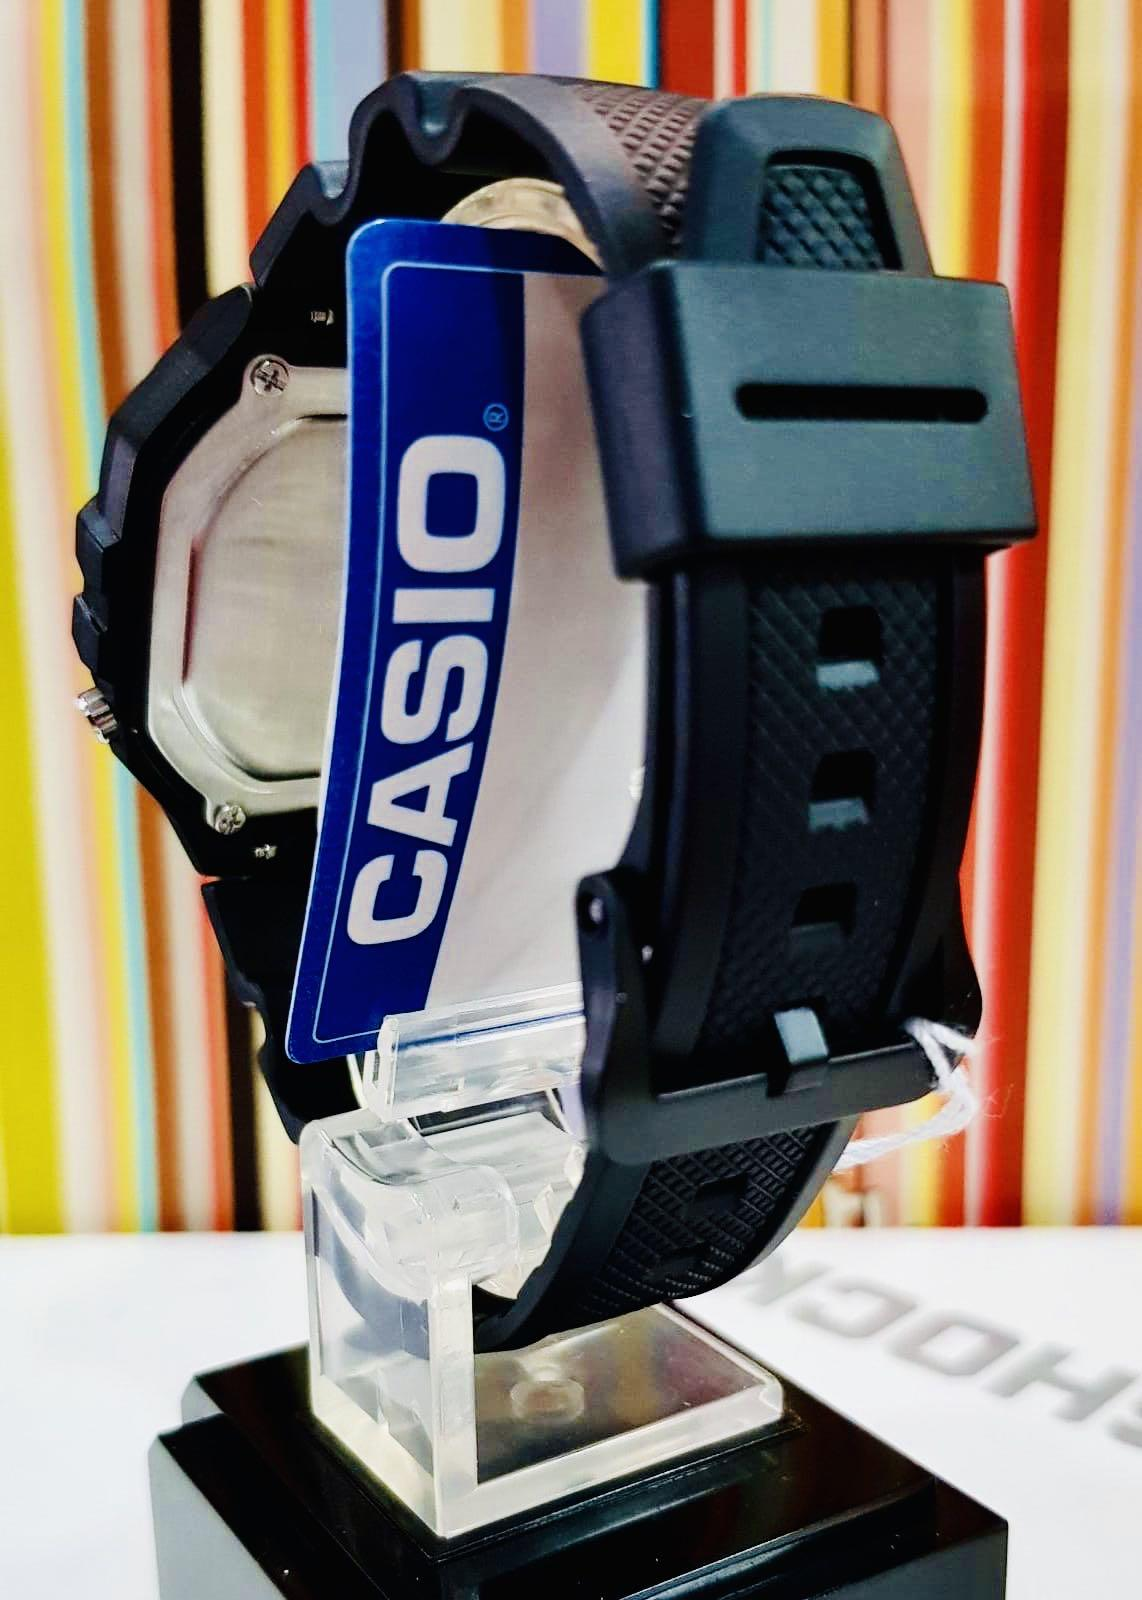 NEW🌟COUPLE💝SET : CASIO UNISEX SPORTS WATCH : 100% ORIGINAL AUTHENTIC : By BABY-G-SHOCK ( GSHOCK ) COMPANY : W-218H-1AV + AQ-S810W-1AV (FULL-BLACK)